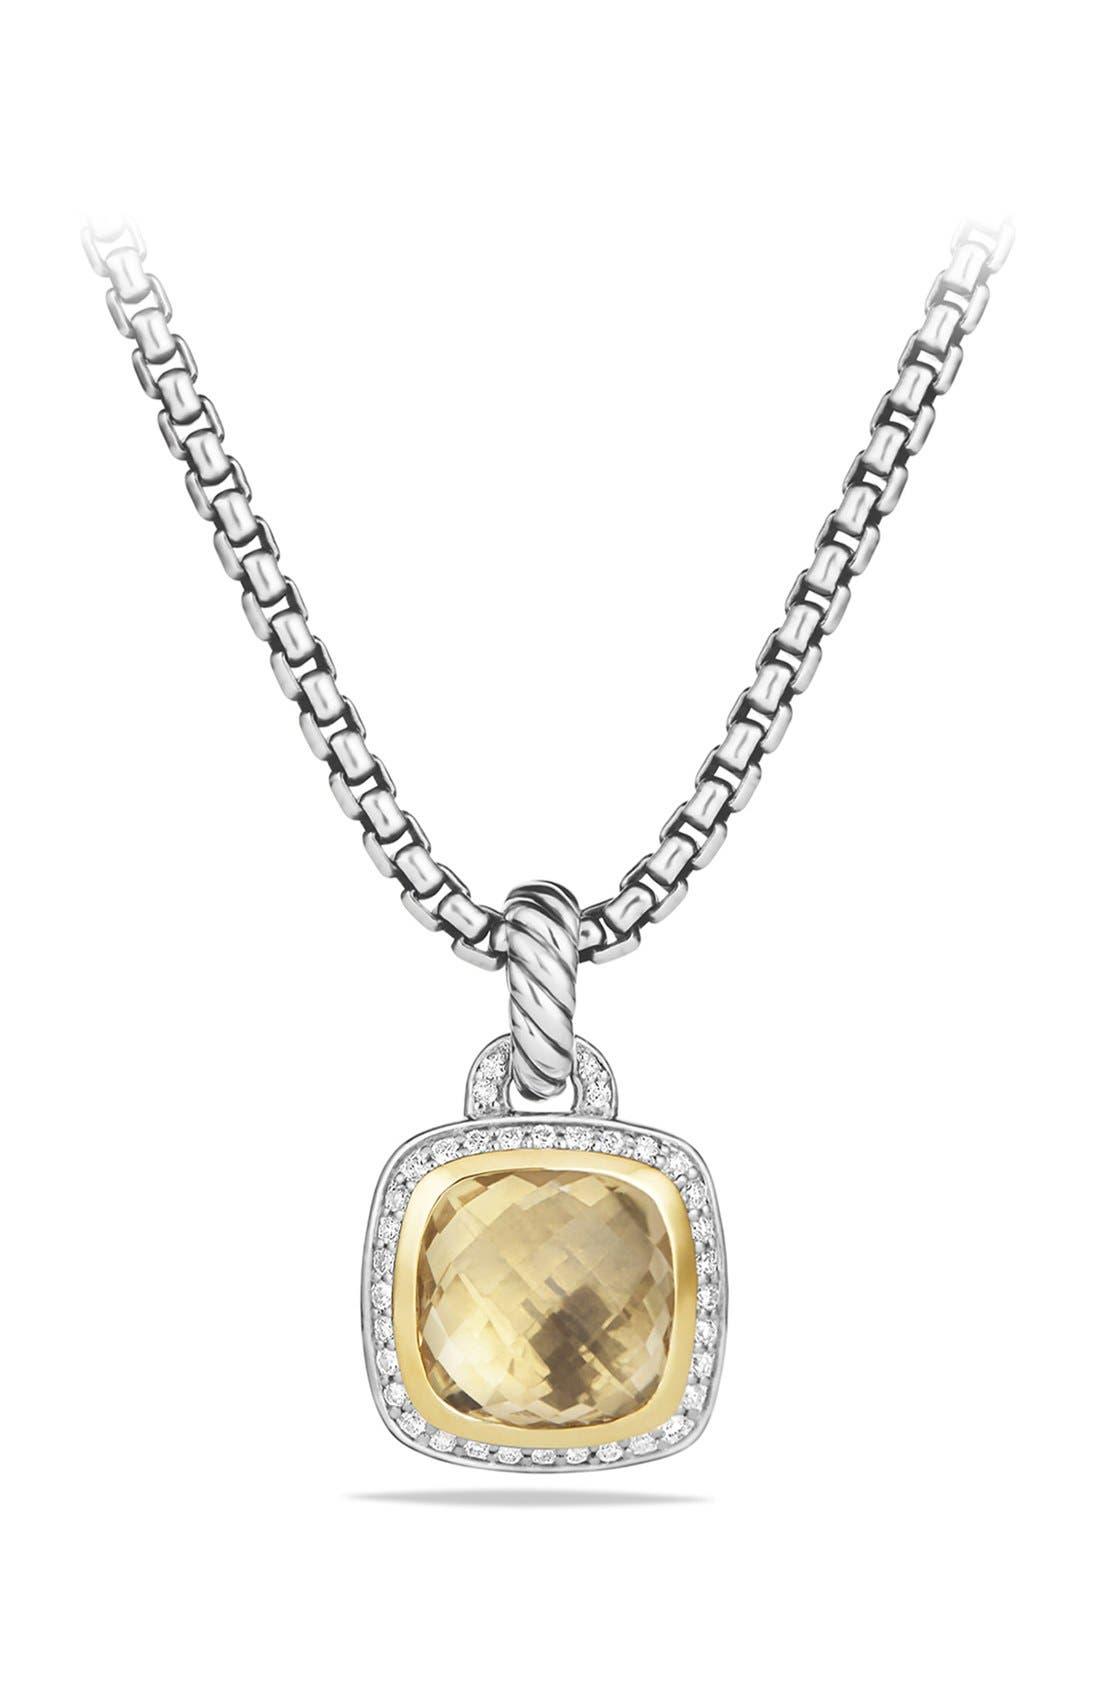 David Yurman'Albion' Pendant with Diamonds and 18K Gold